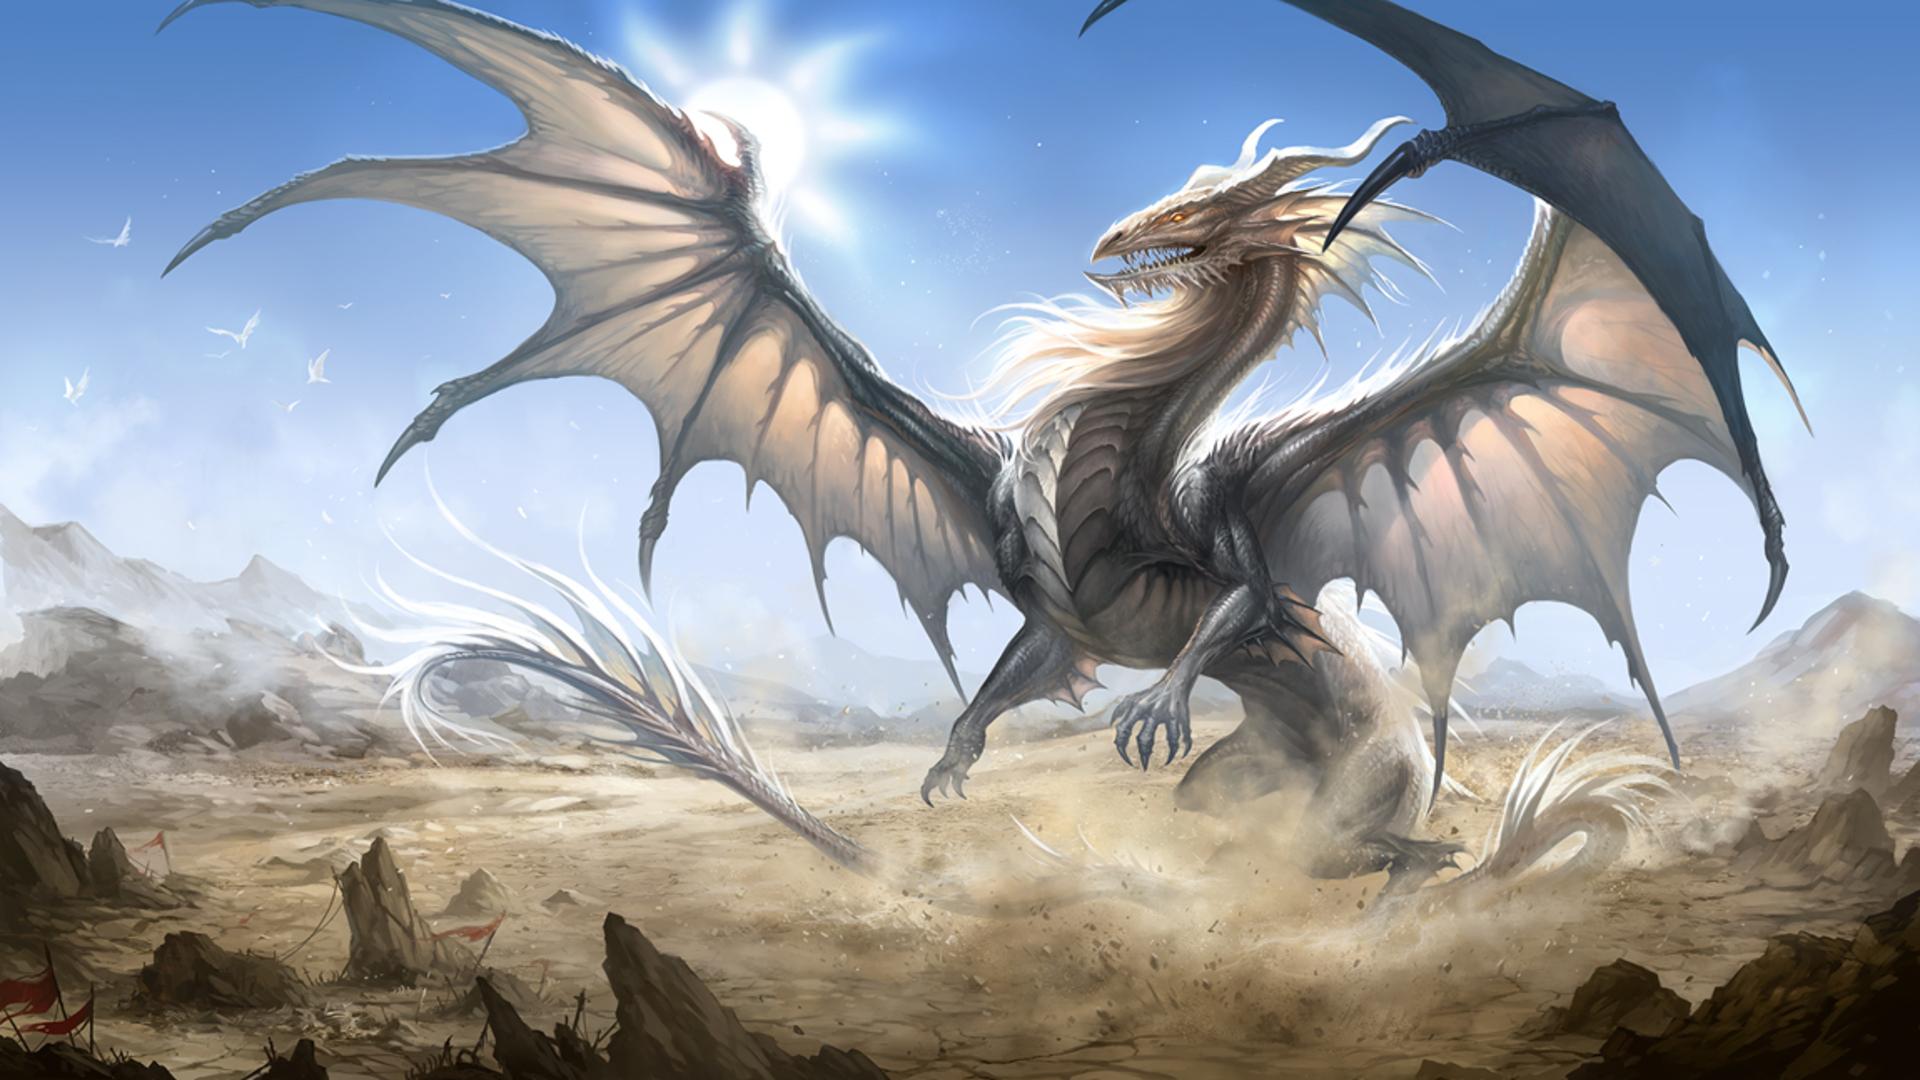 Dragon Wallpaper Android Phones 5141 Wallpaper Cool Walldiskpaper 1920x1080